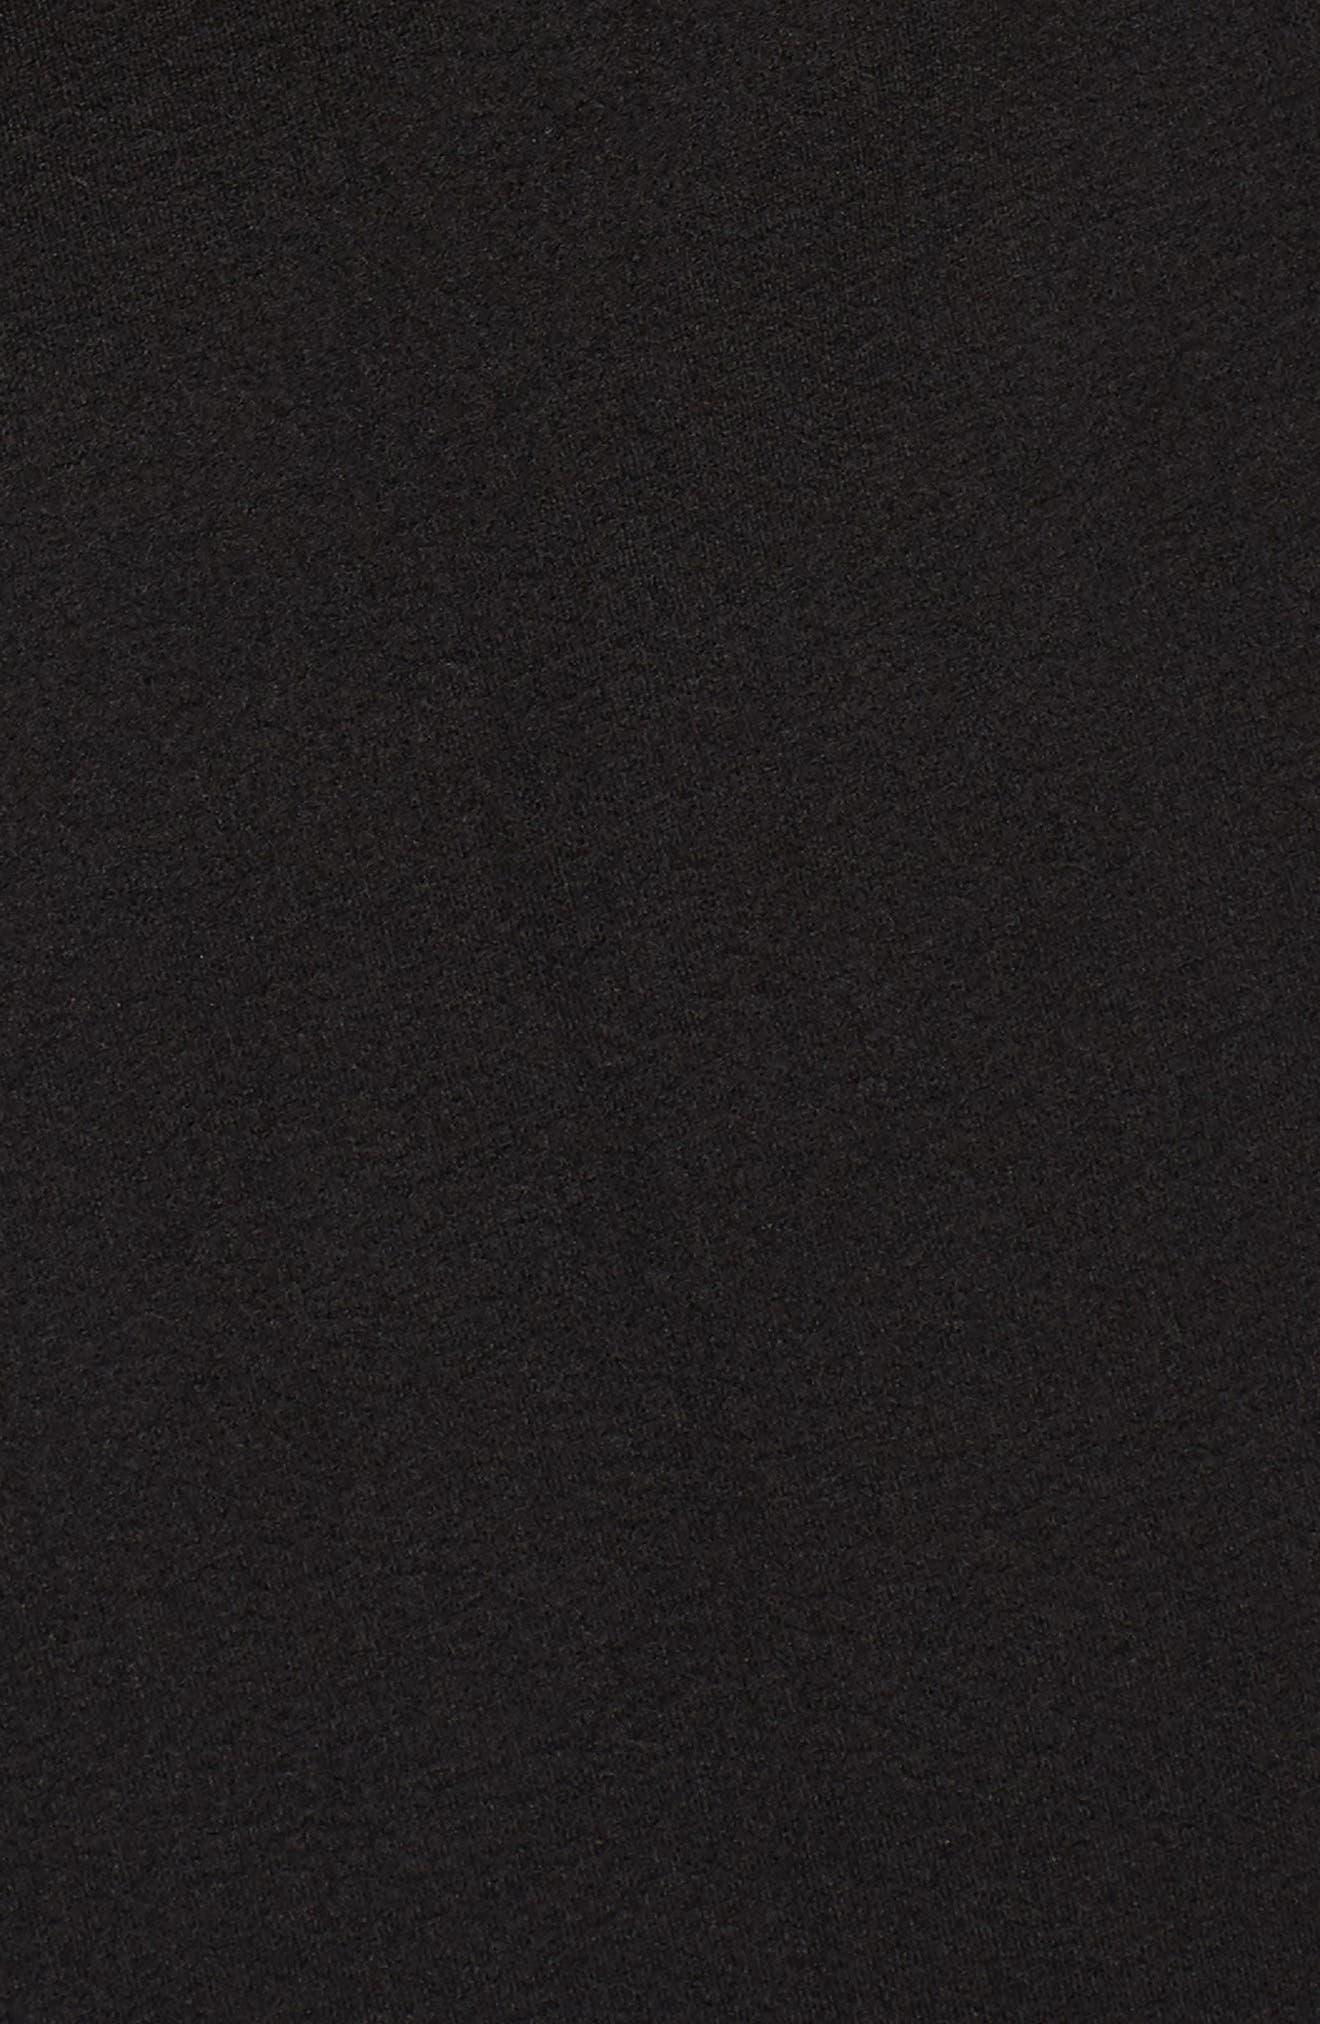 Ruched Surplice Crepe Sheath Dress,                             Alternate thumbnail 6, color,                             BLACK